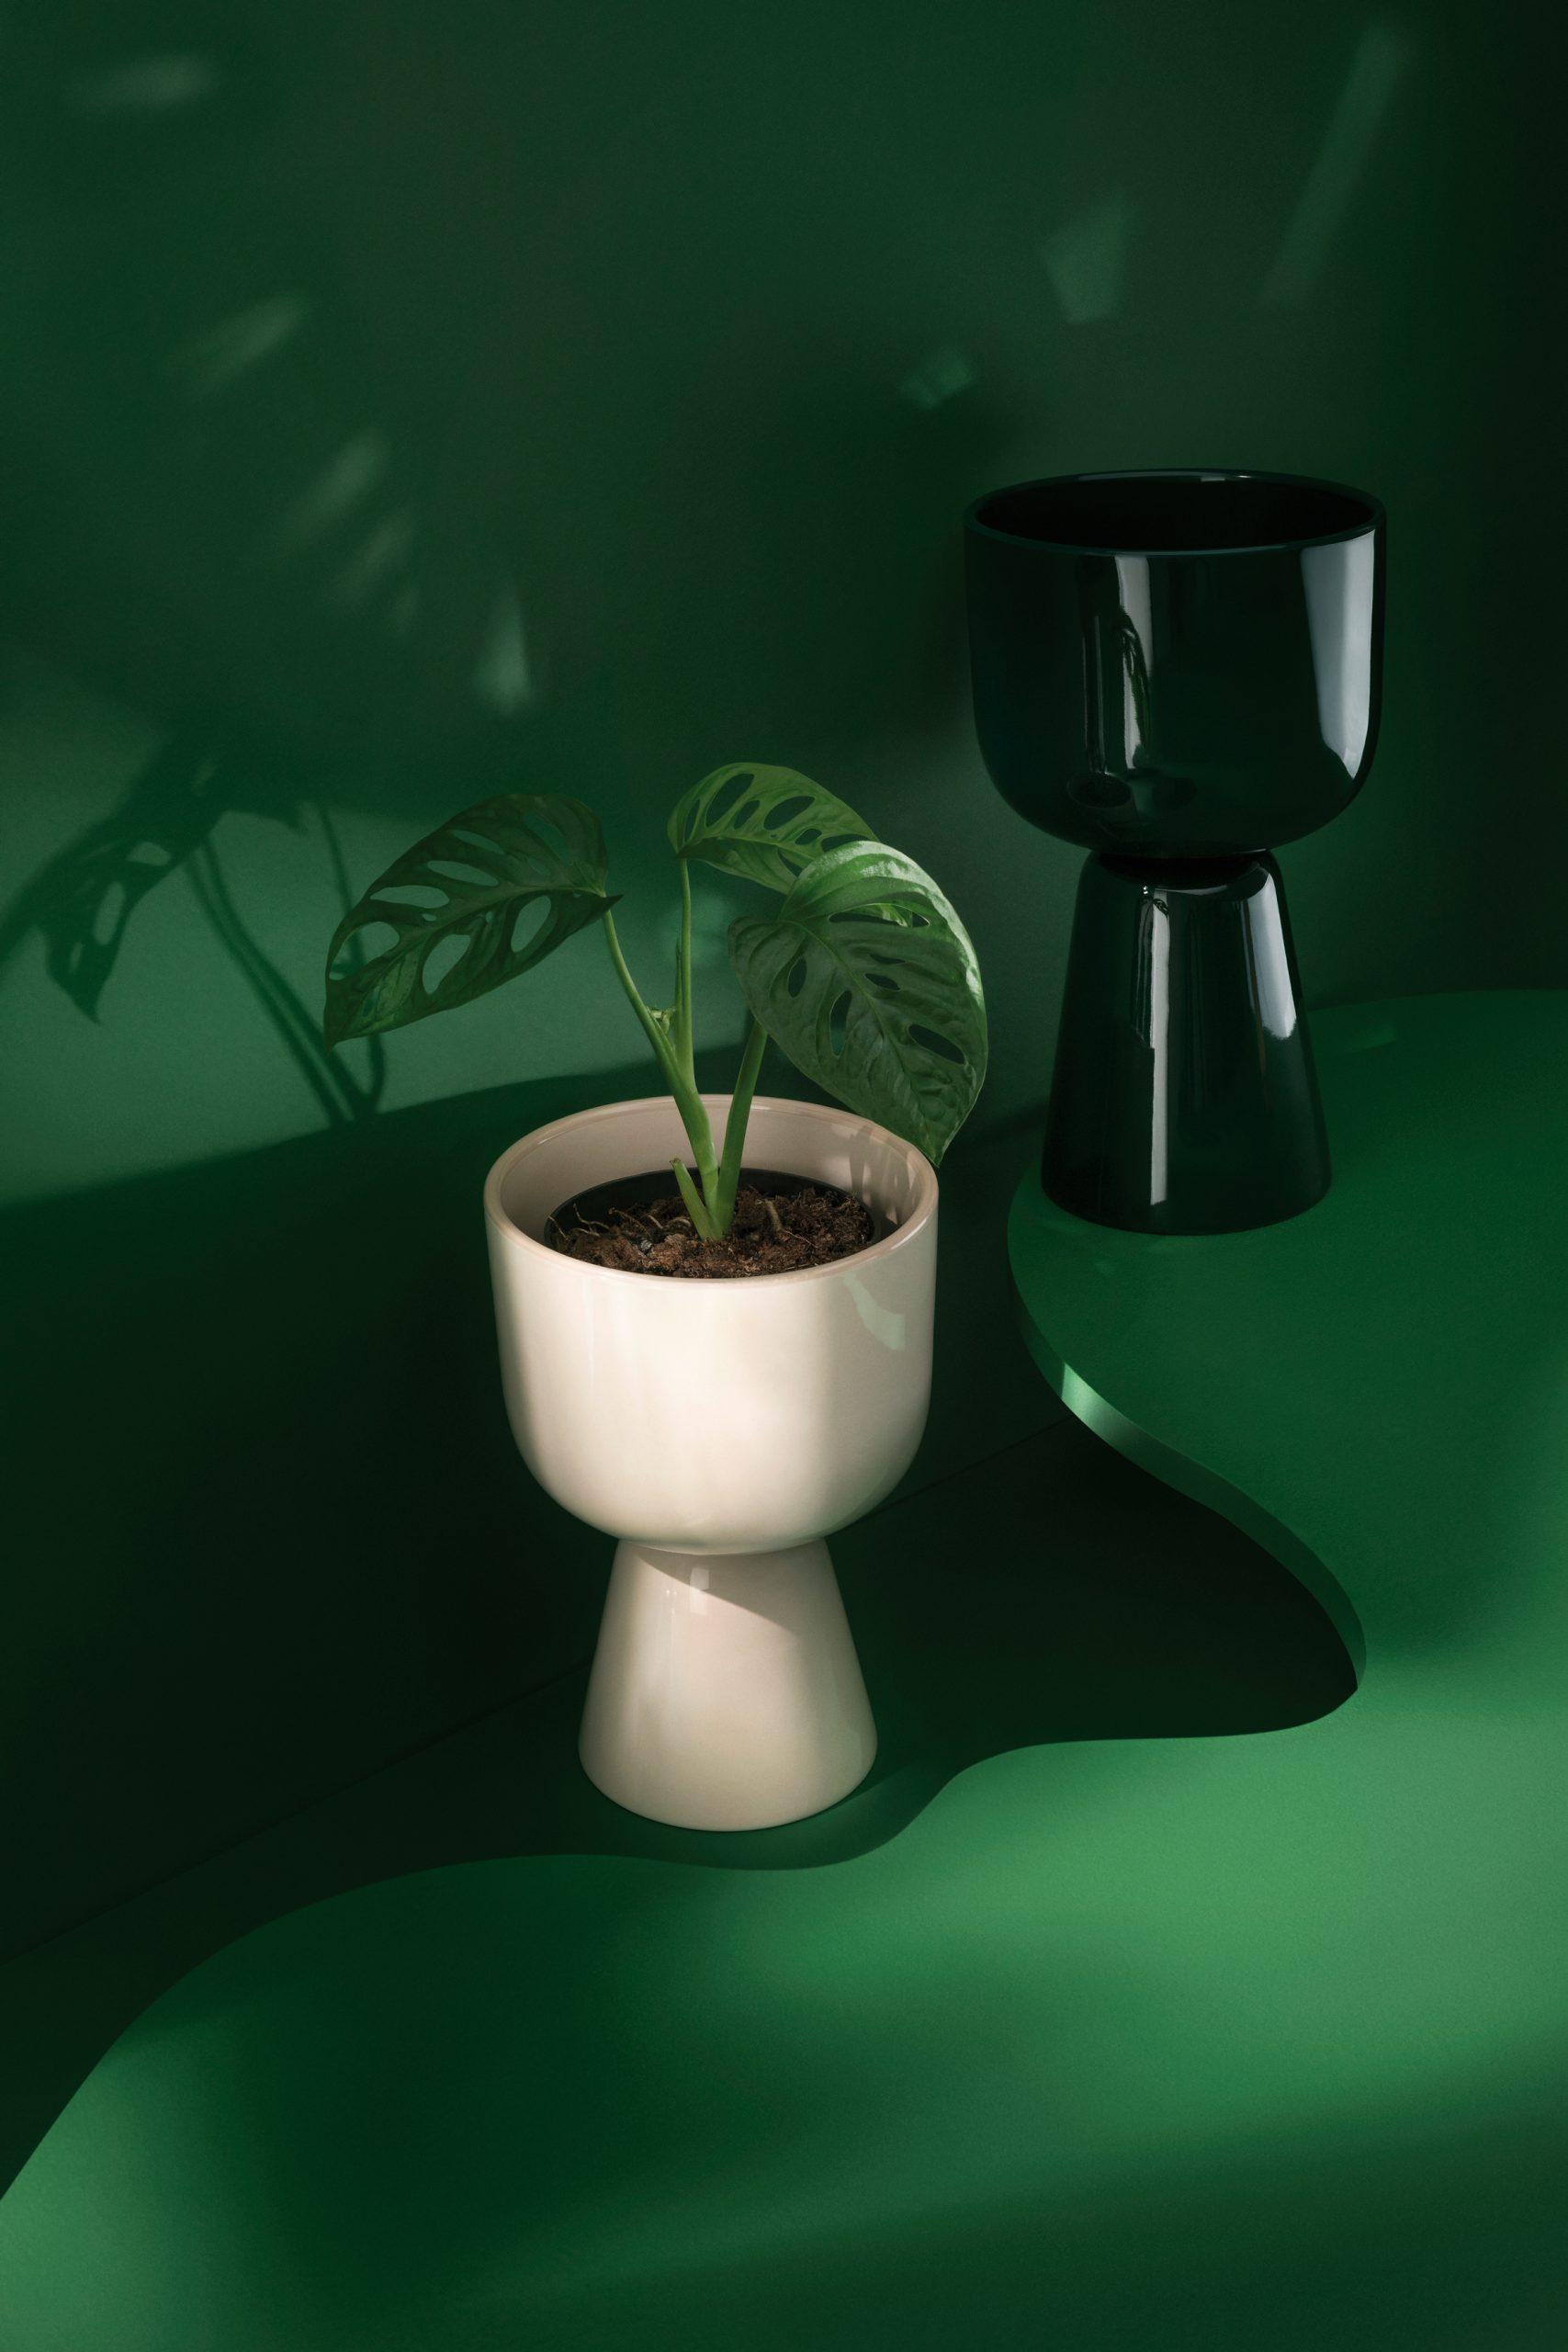 Nappula from Iittala for Dezeen x Planted